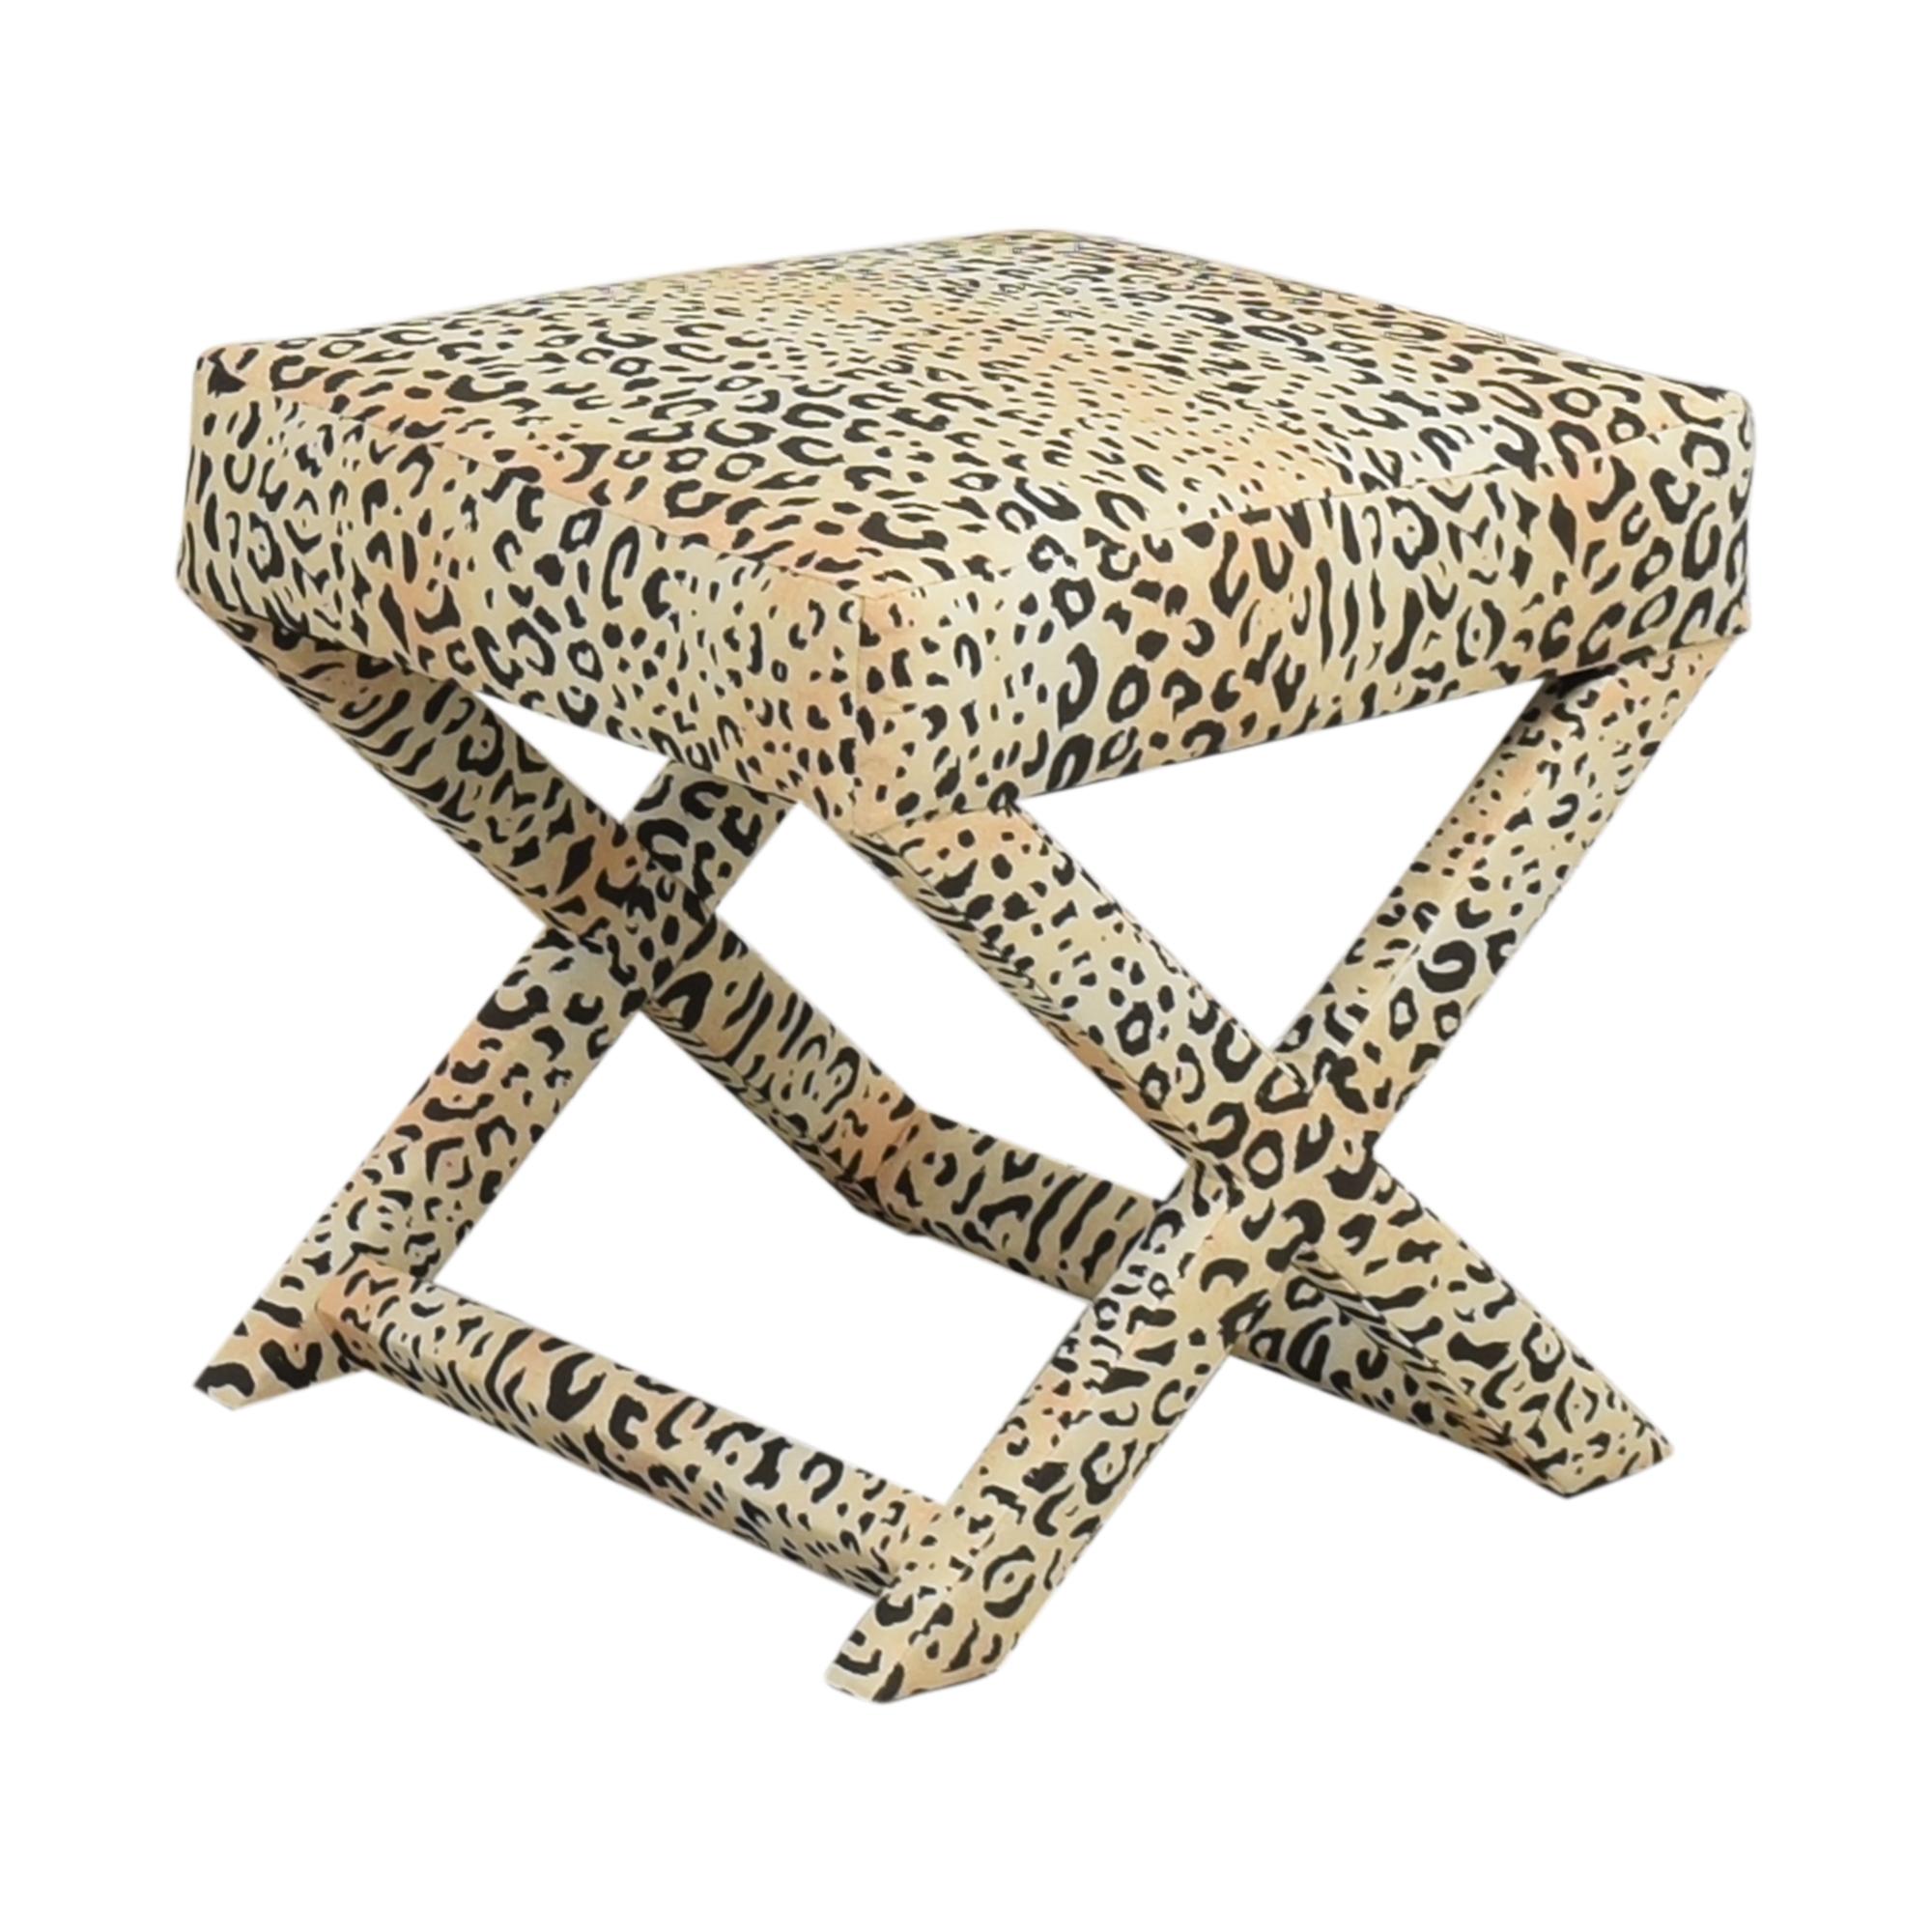 The Inside X-Bench in Leopard sale